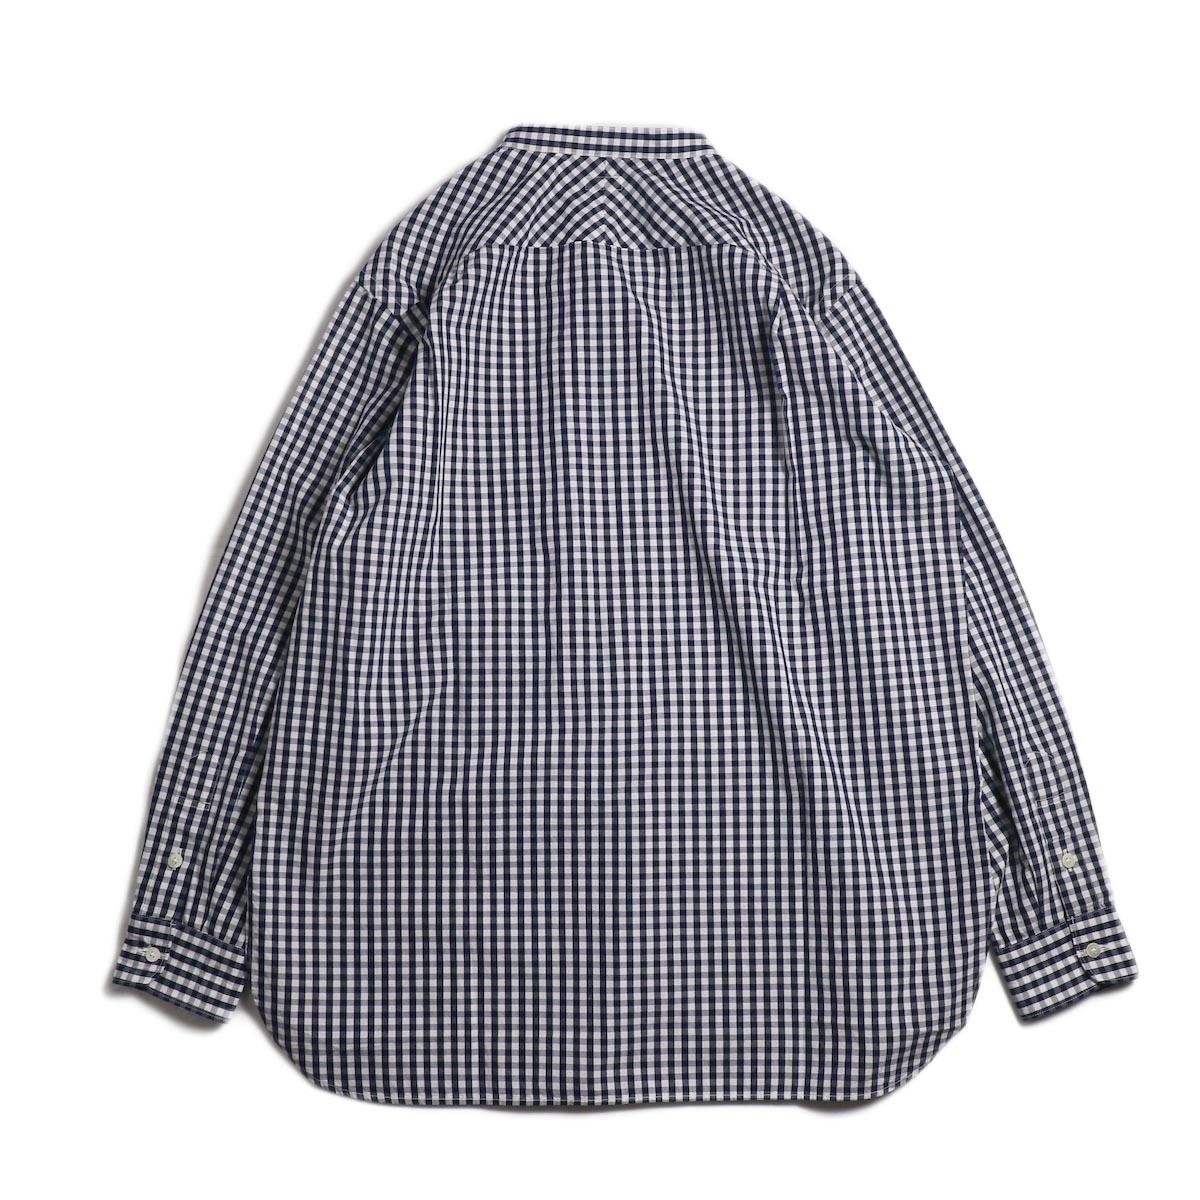 blurhms / Polish Chambray Band Collar Shirt L/S -GMCH-Navy 背面